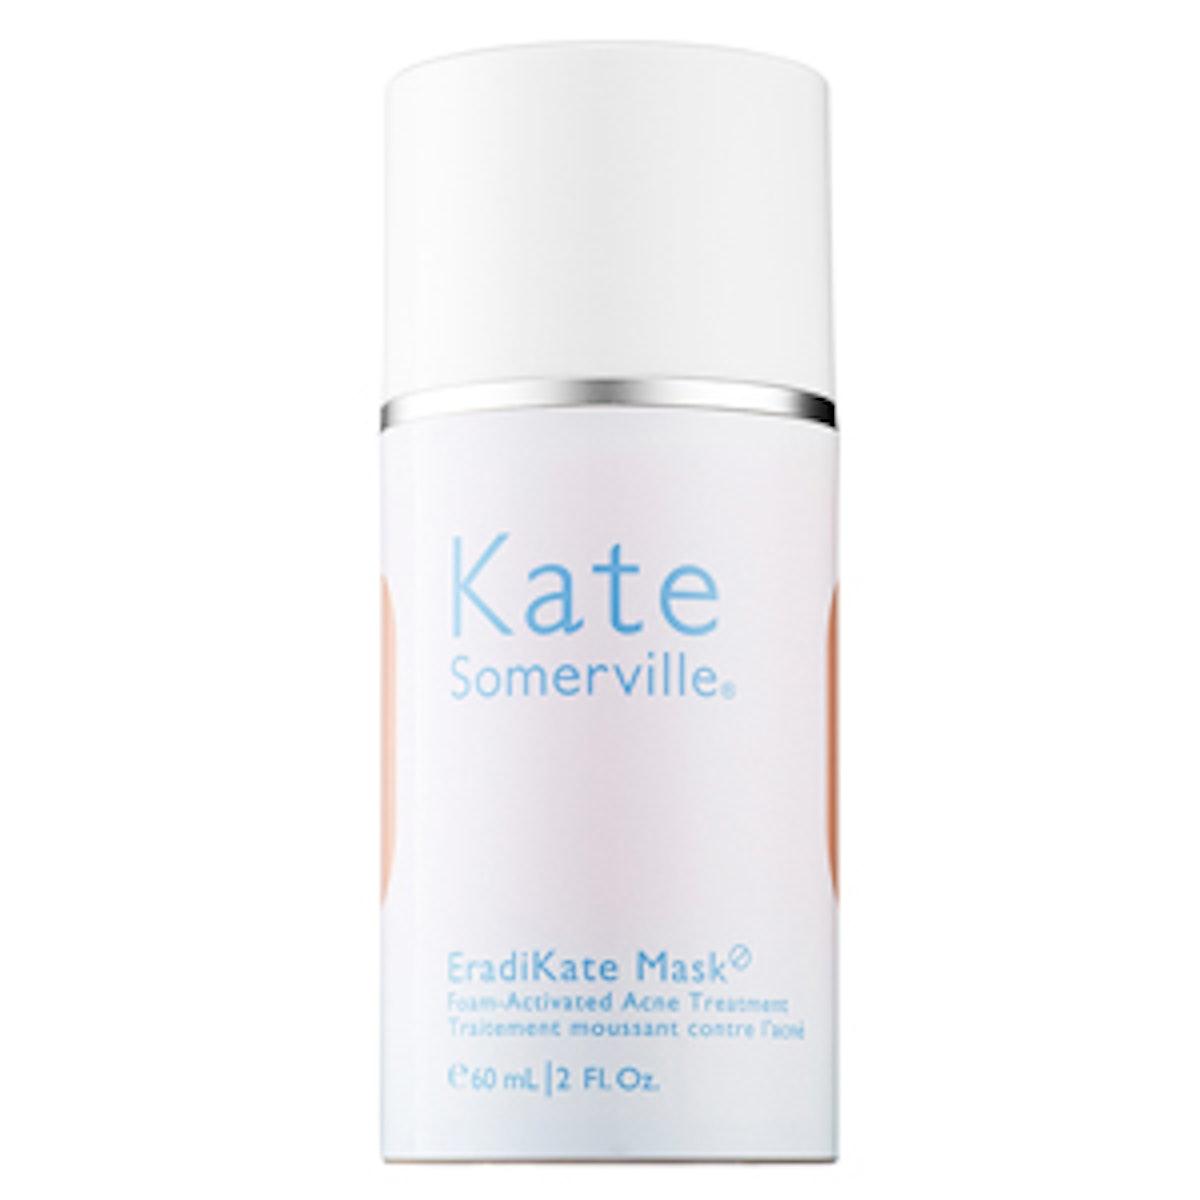 EradiKate Mask Foam-Activated Acne Treatment